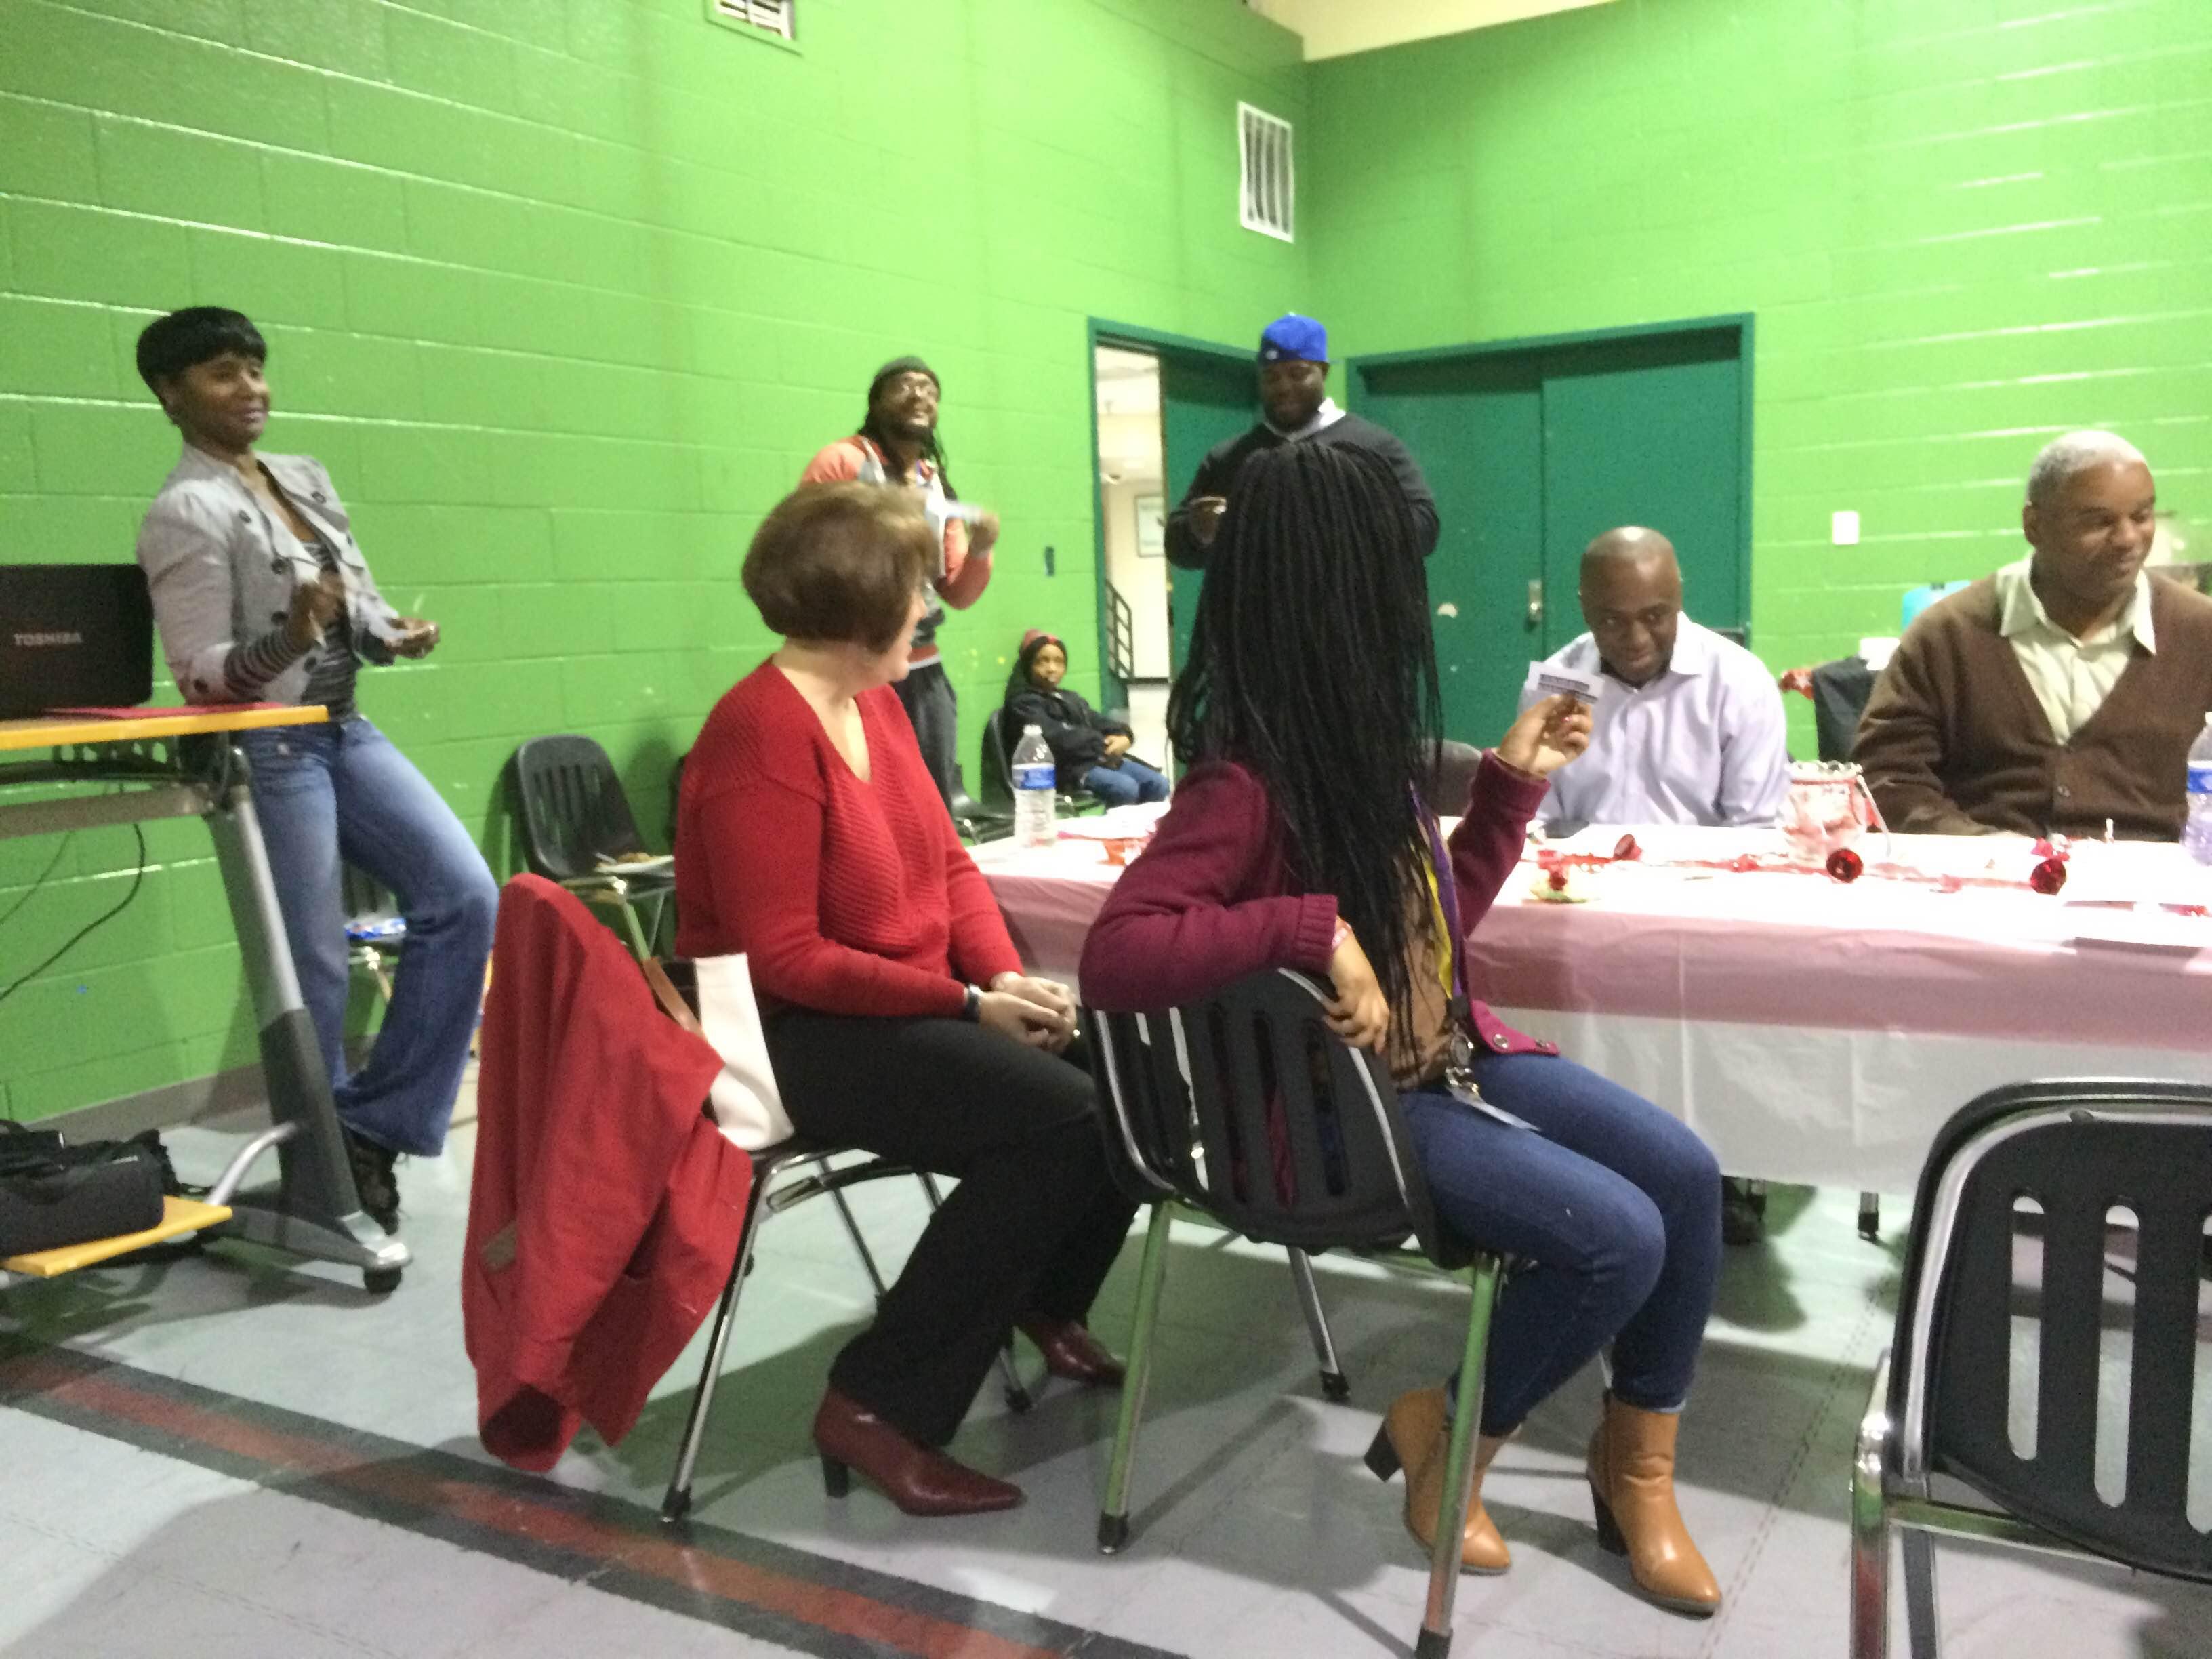 Niles Board, Staff and Volunteers Enjoy Holiday Fun Together